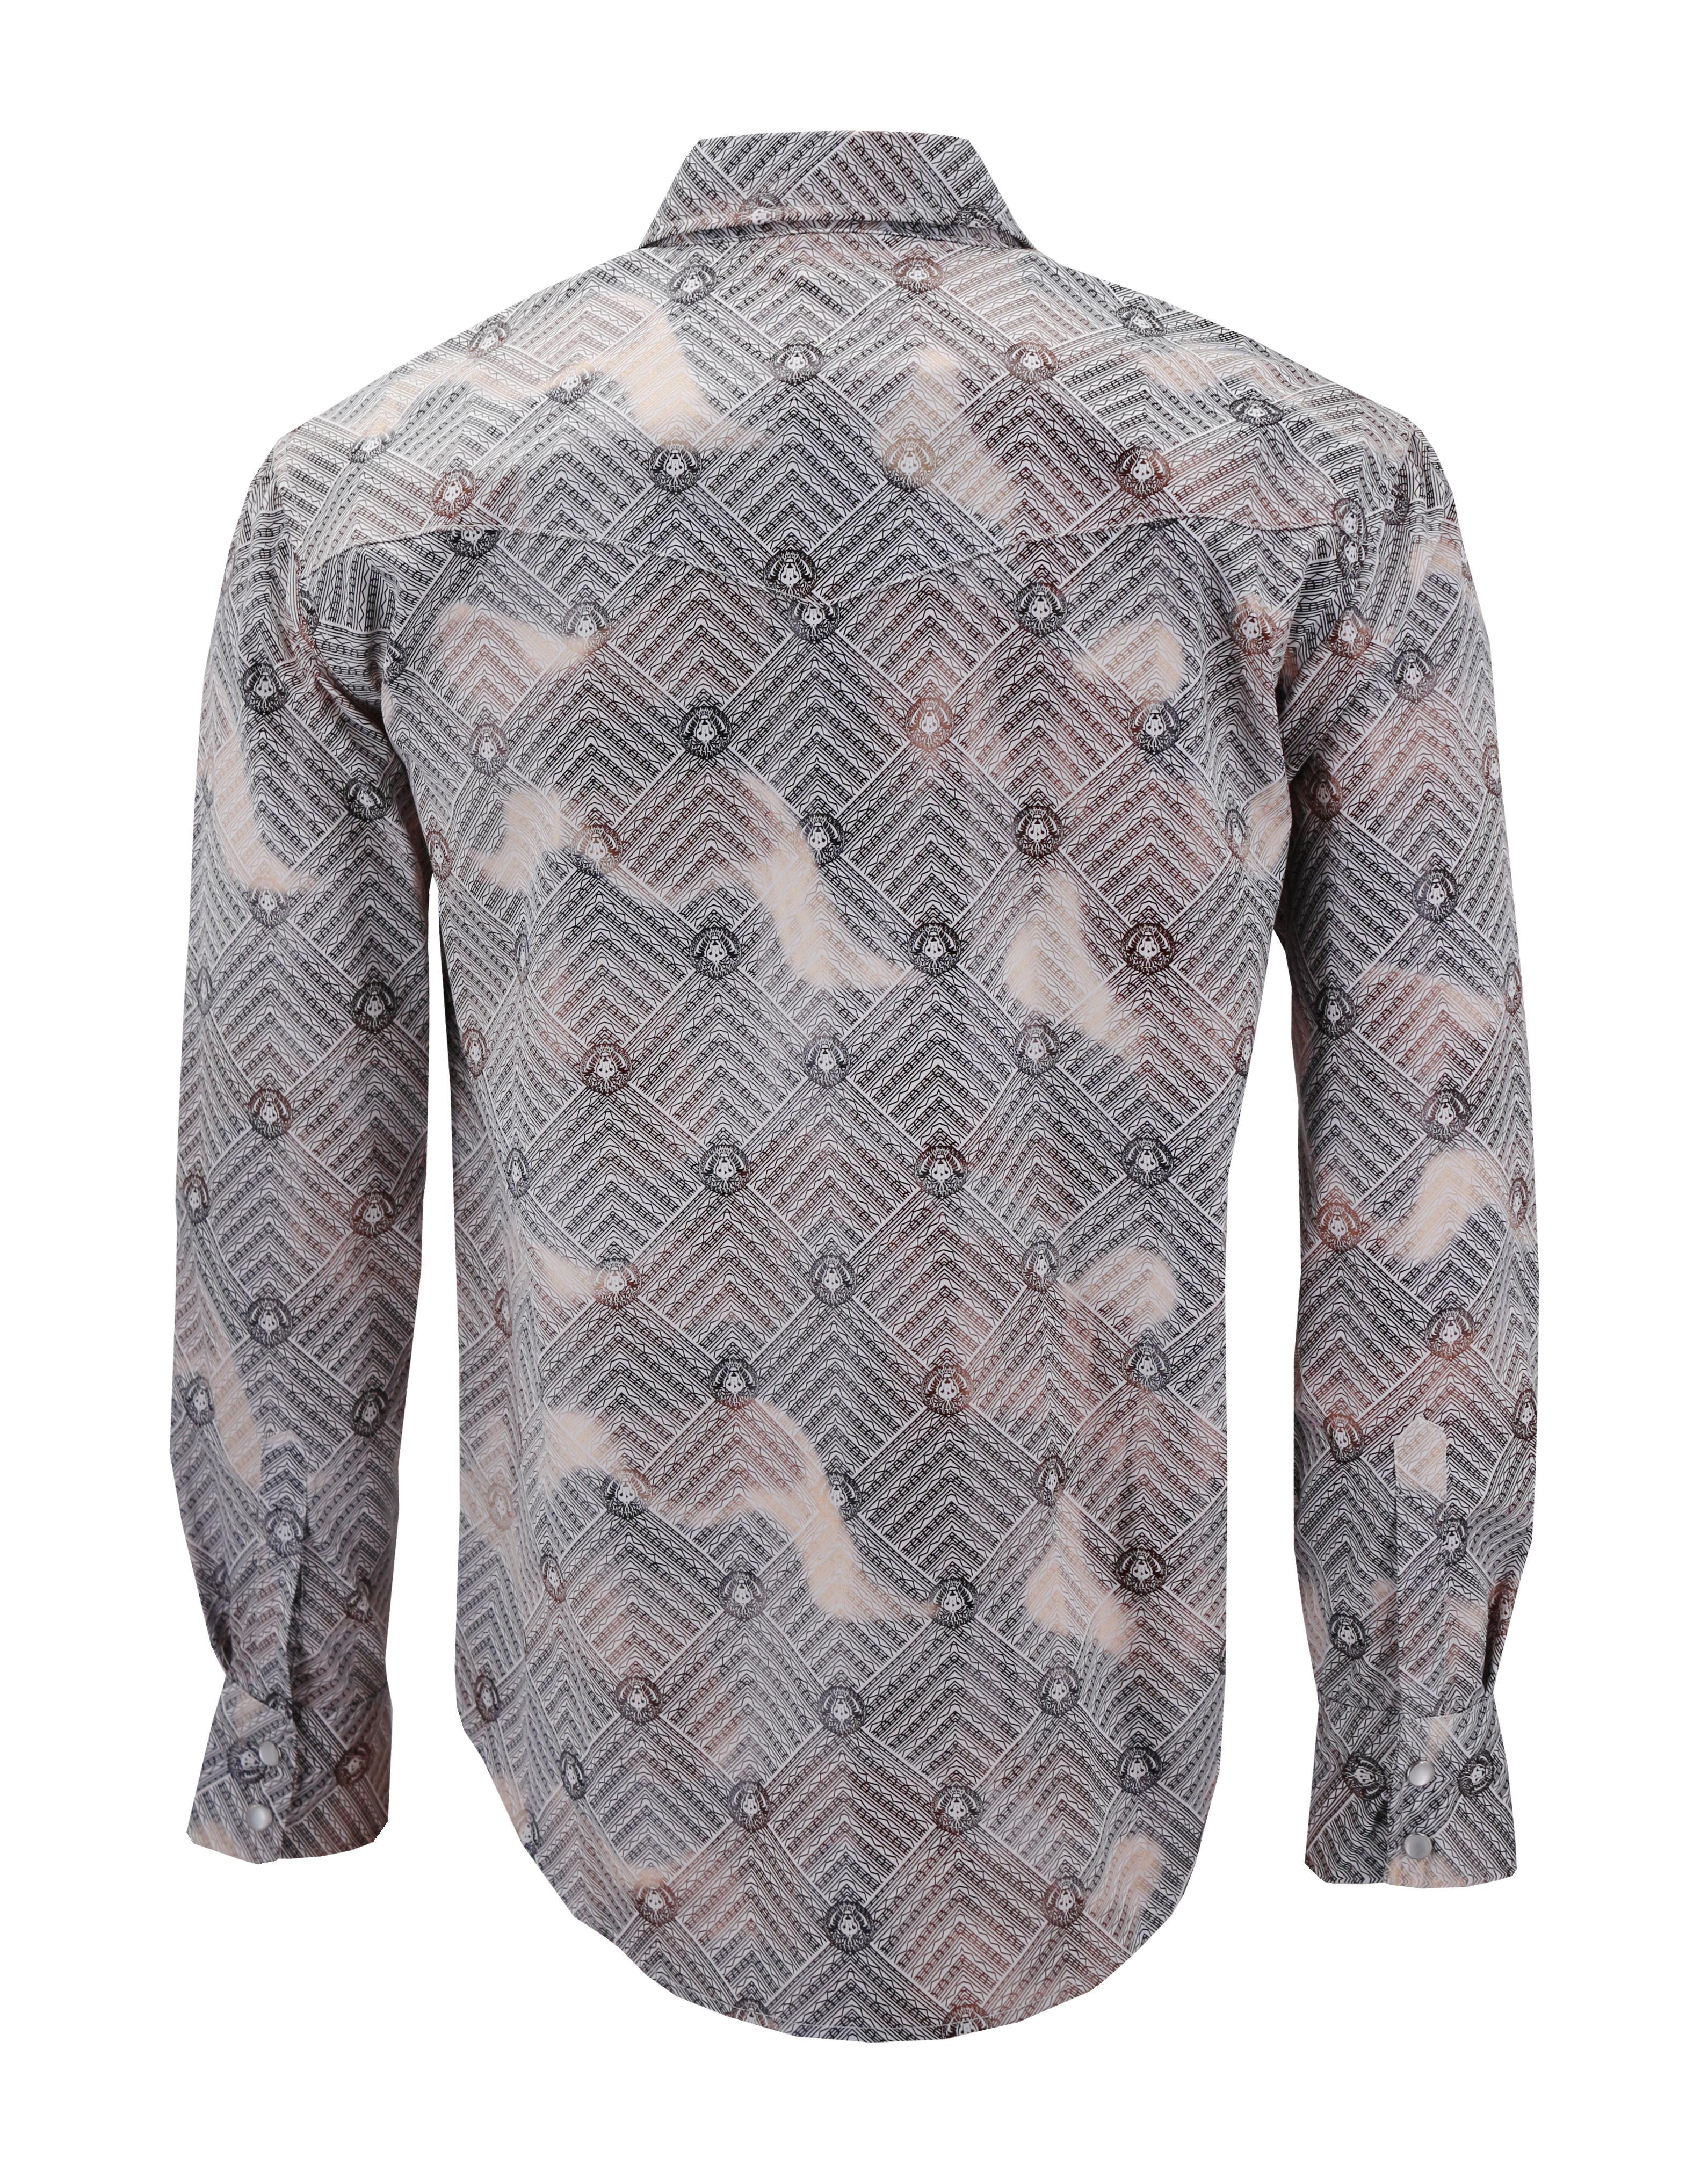 Men-039-s-Western-Long-Sleeve-Stylish-Metallic-Modern-Cowboy-Rodeo-Dress-Shirt thumbnail 19